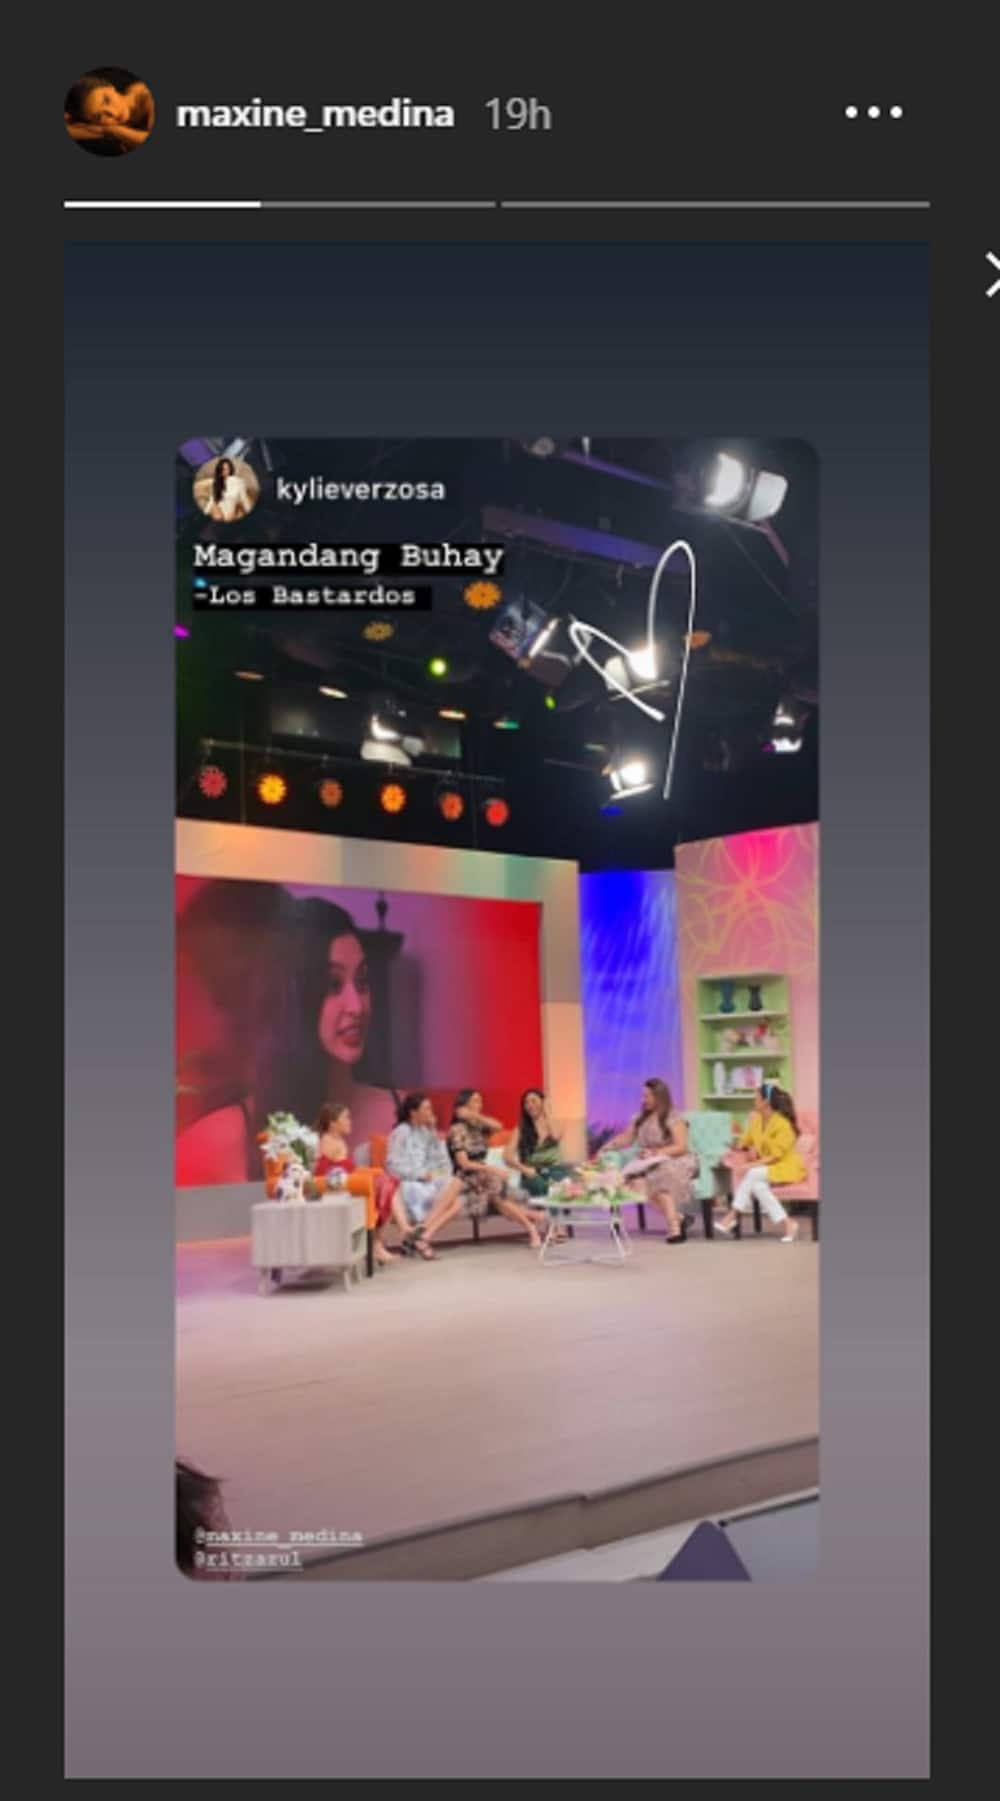 Maxine Medina reposts Kylie Verzosa's social media post amid spitting issue